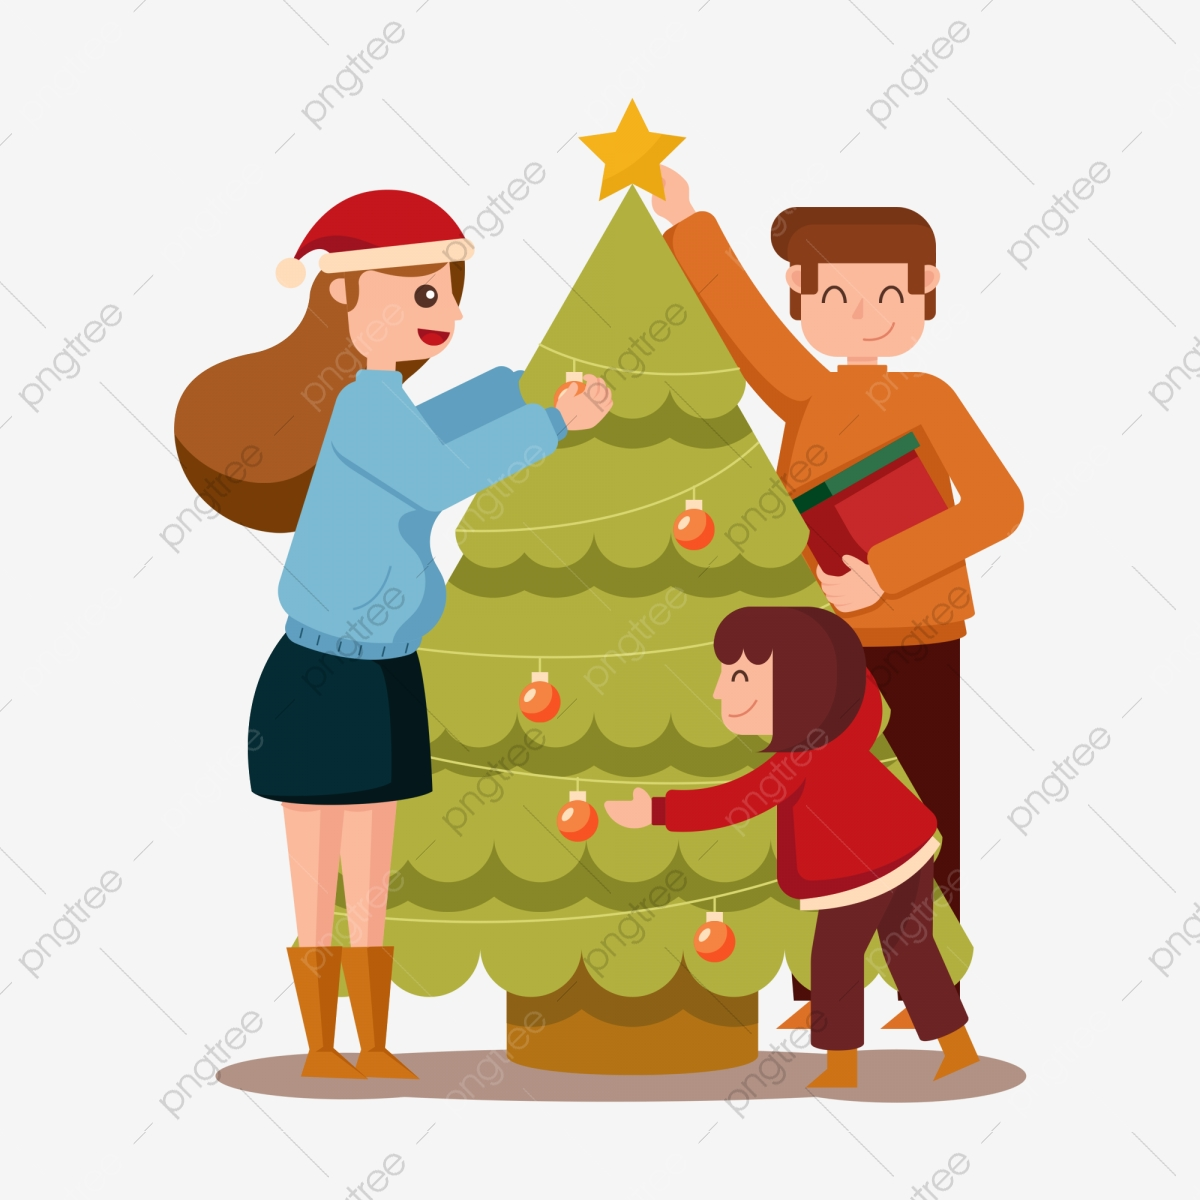 Watak Kartun Minimalis Watak Hiasan Pohon Natal Pohon Natal